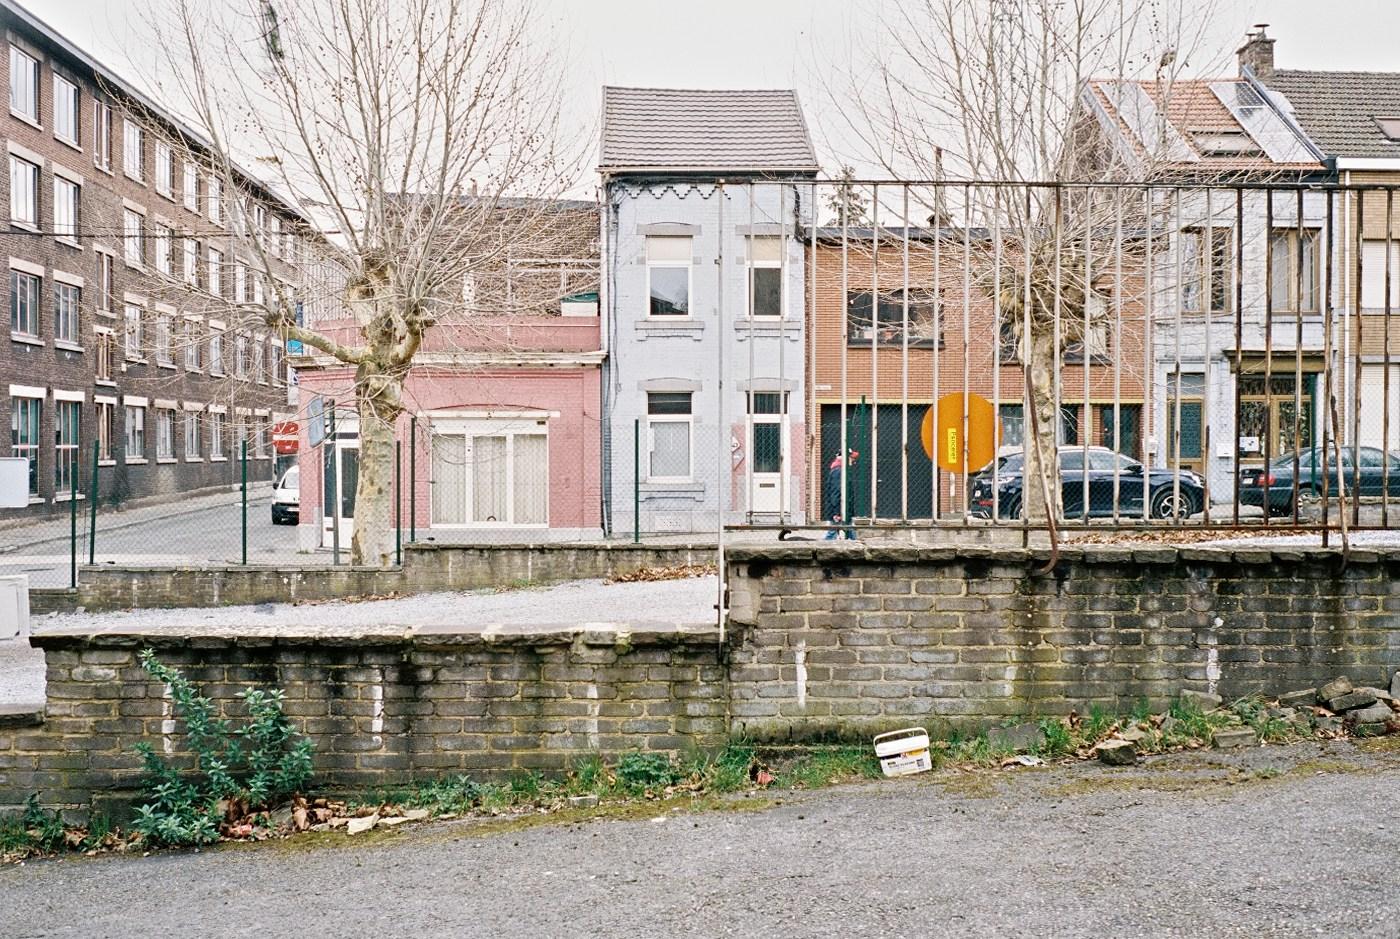 000042JoergBergs-KodakPortra400-MeinFilmLab-M7-35 (1)